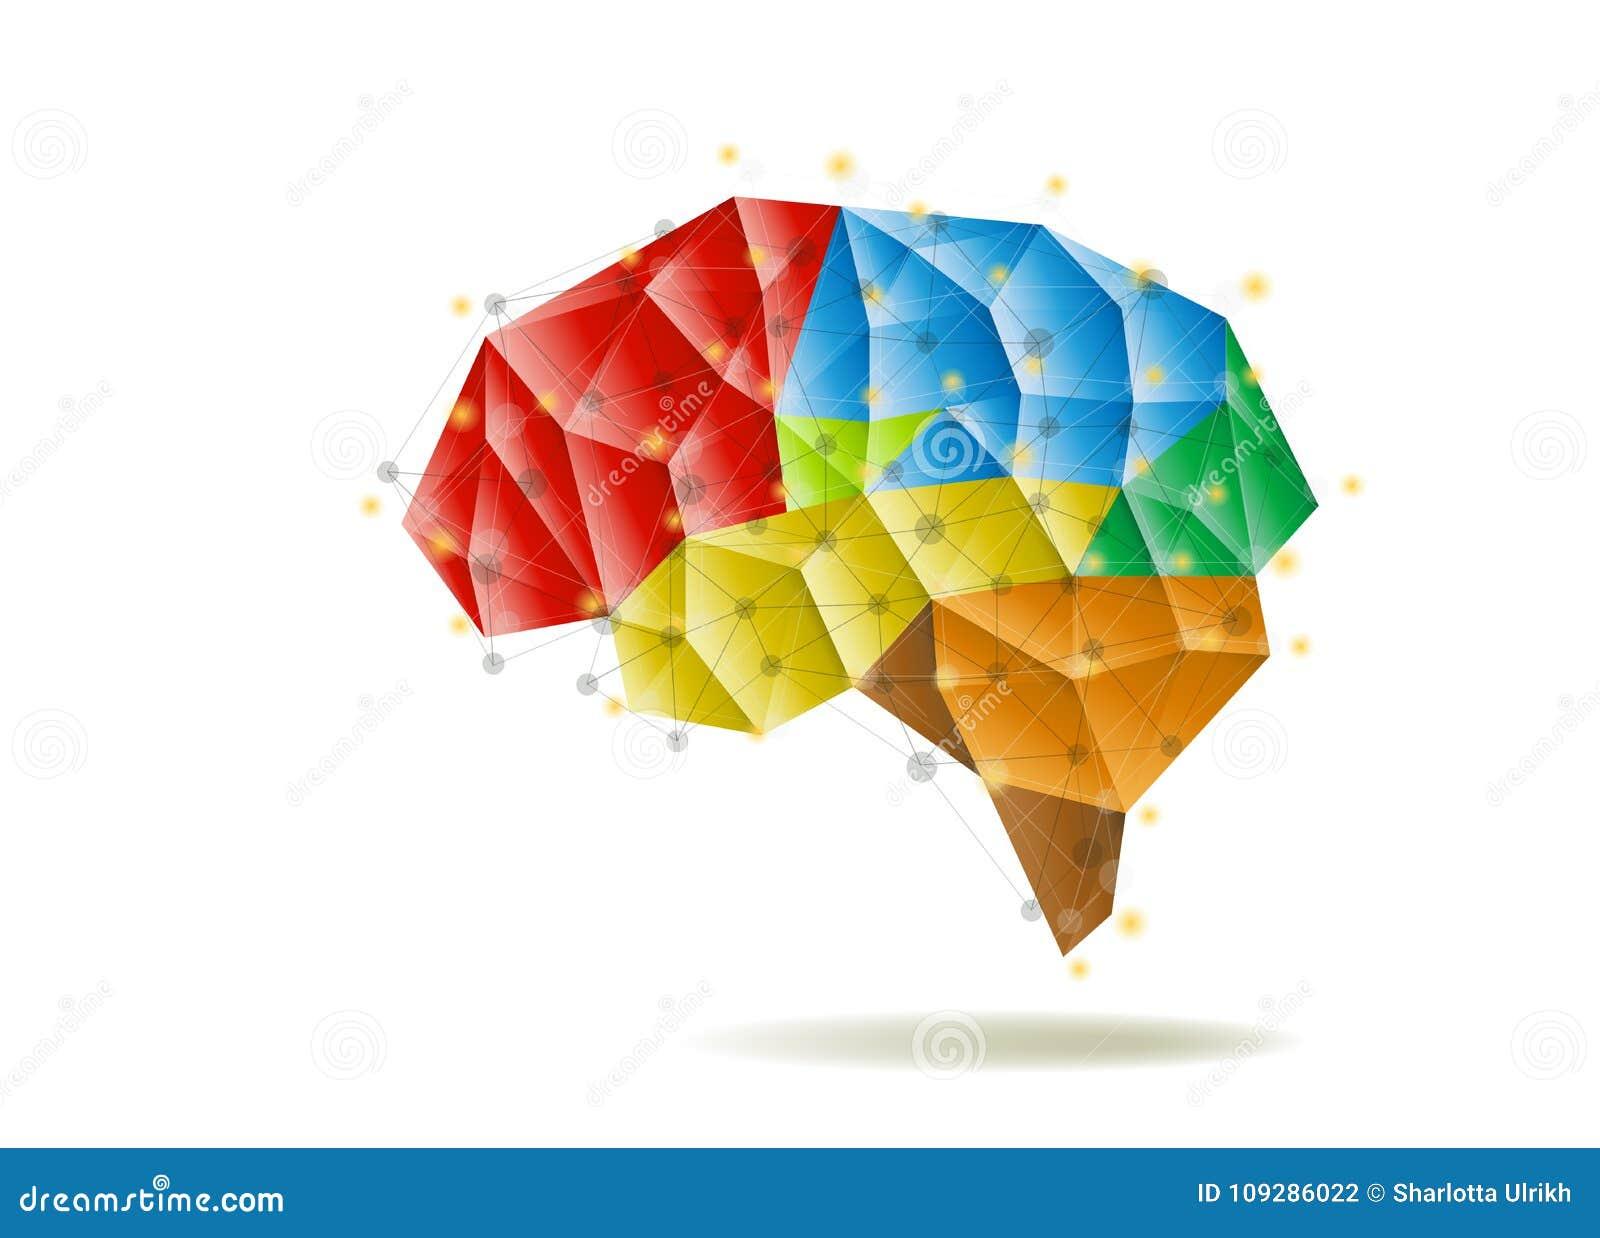 Human Brain Anatomy Structure Vector Illustration Stock Vector